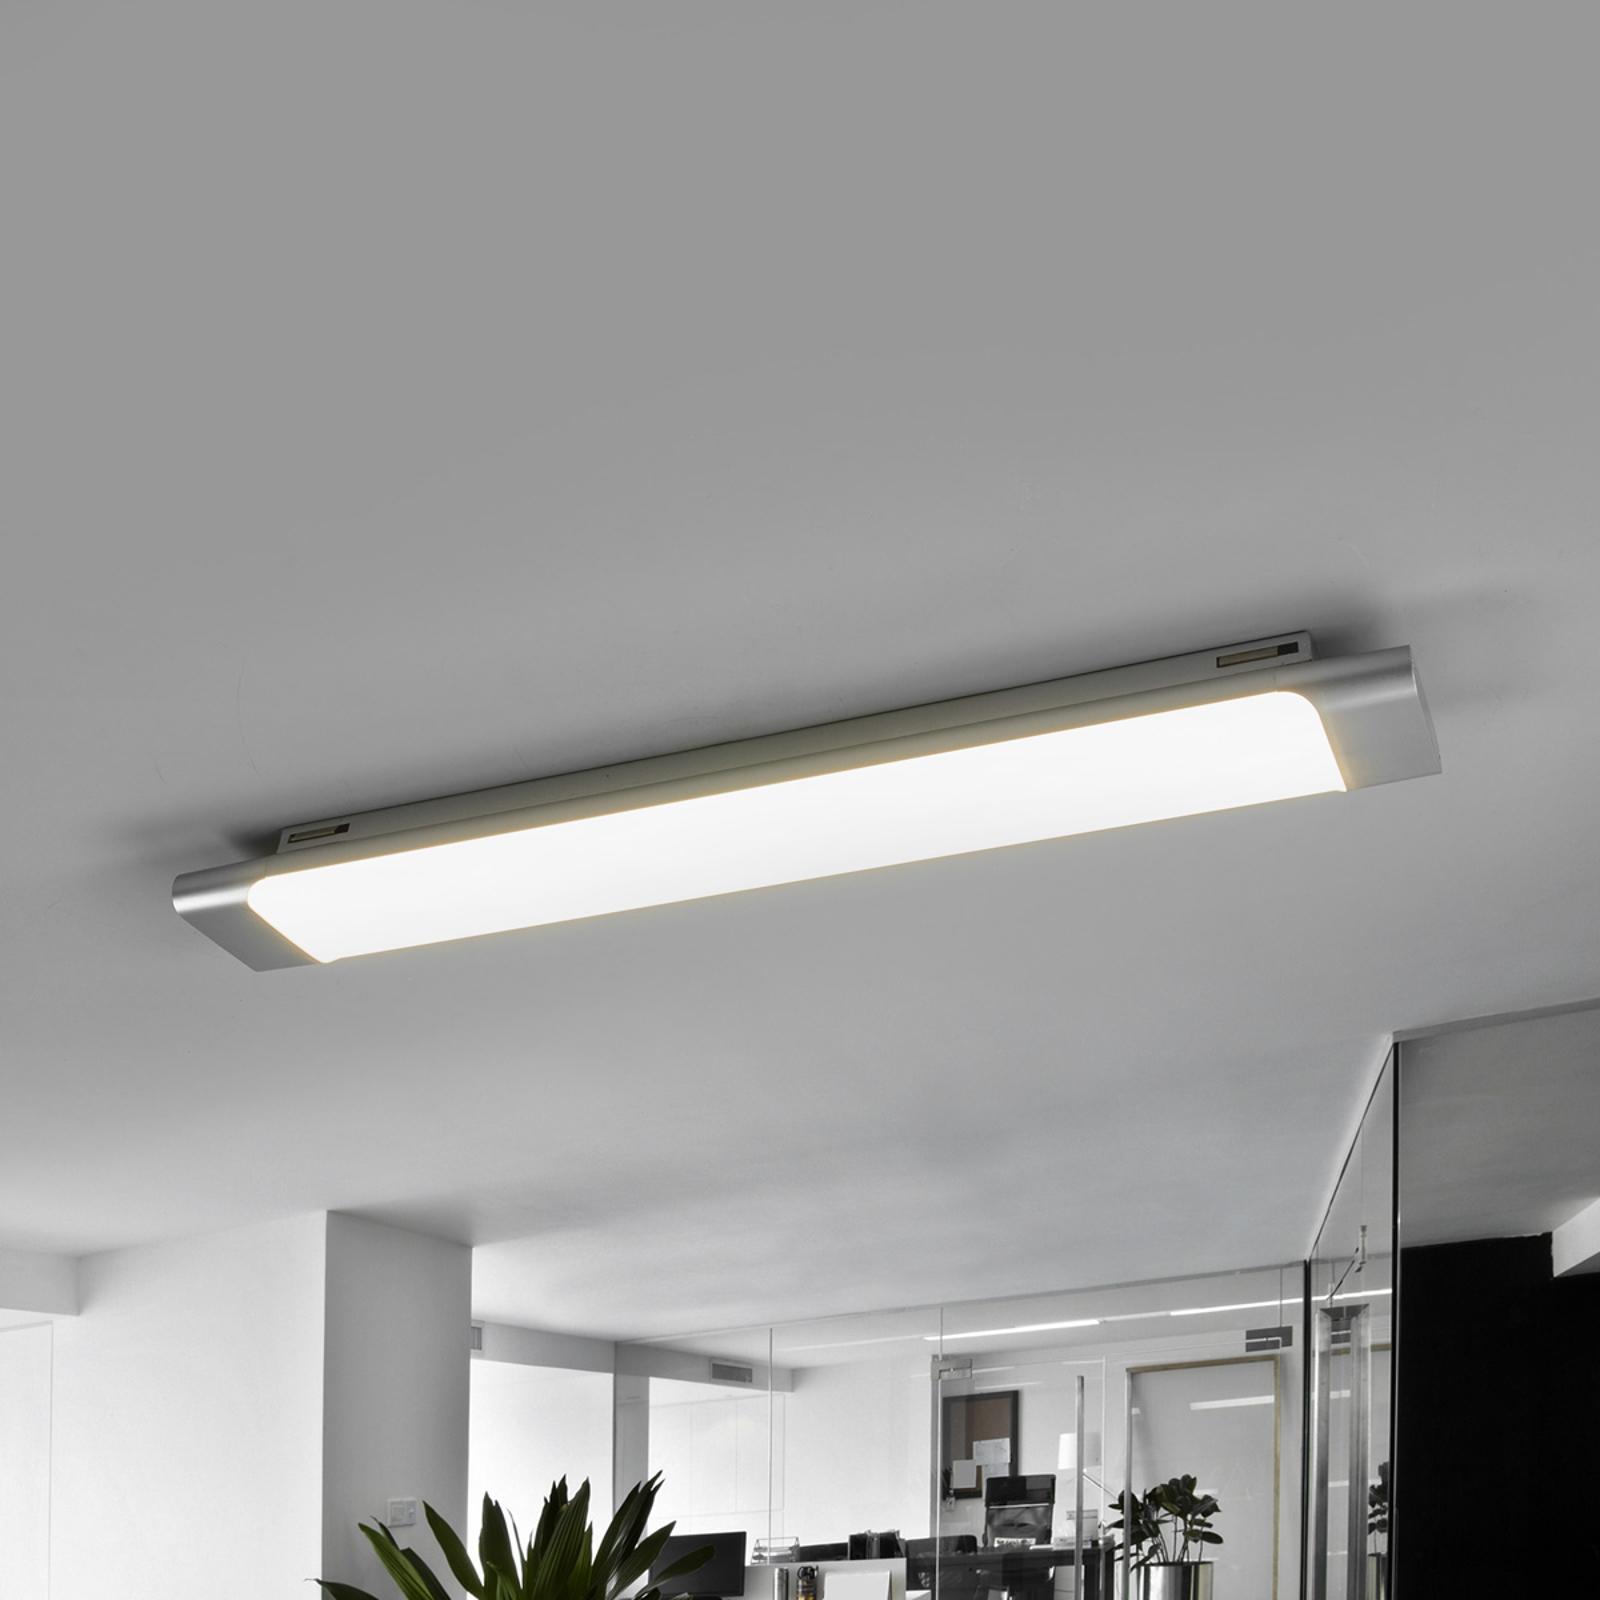 Lampa sufitowa LED Vinca,, 60 cm